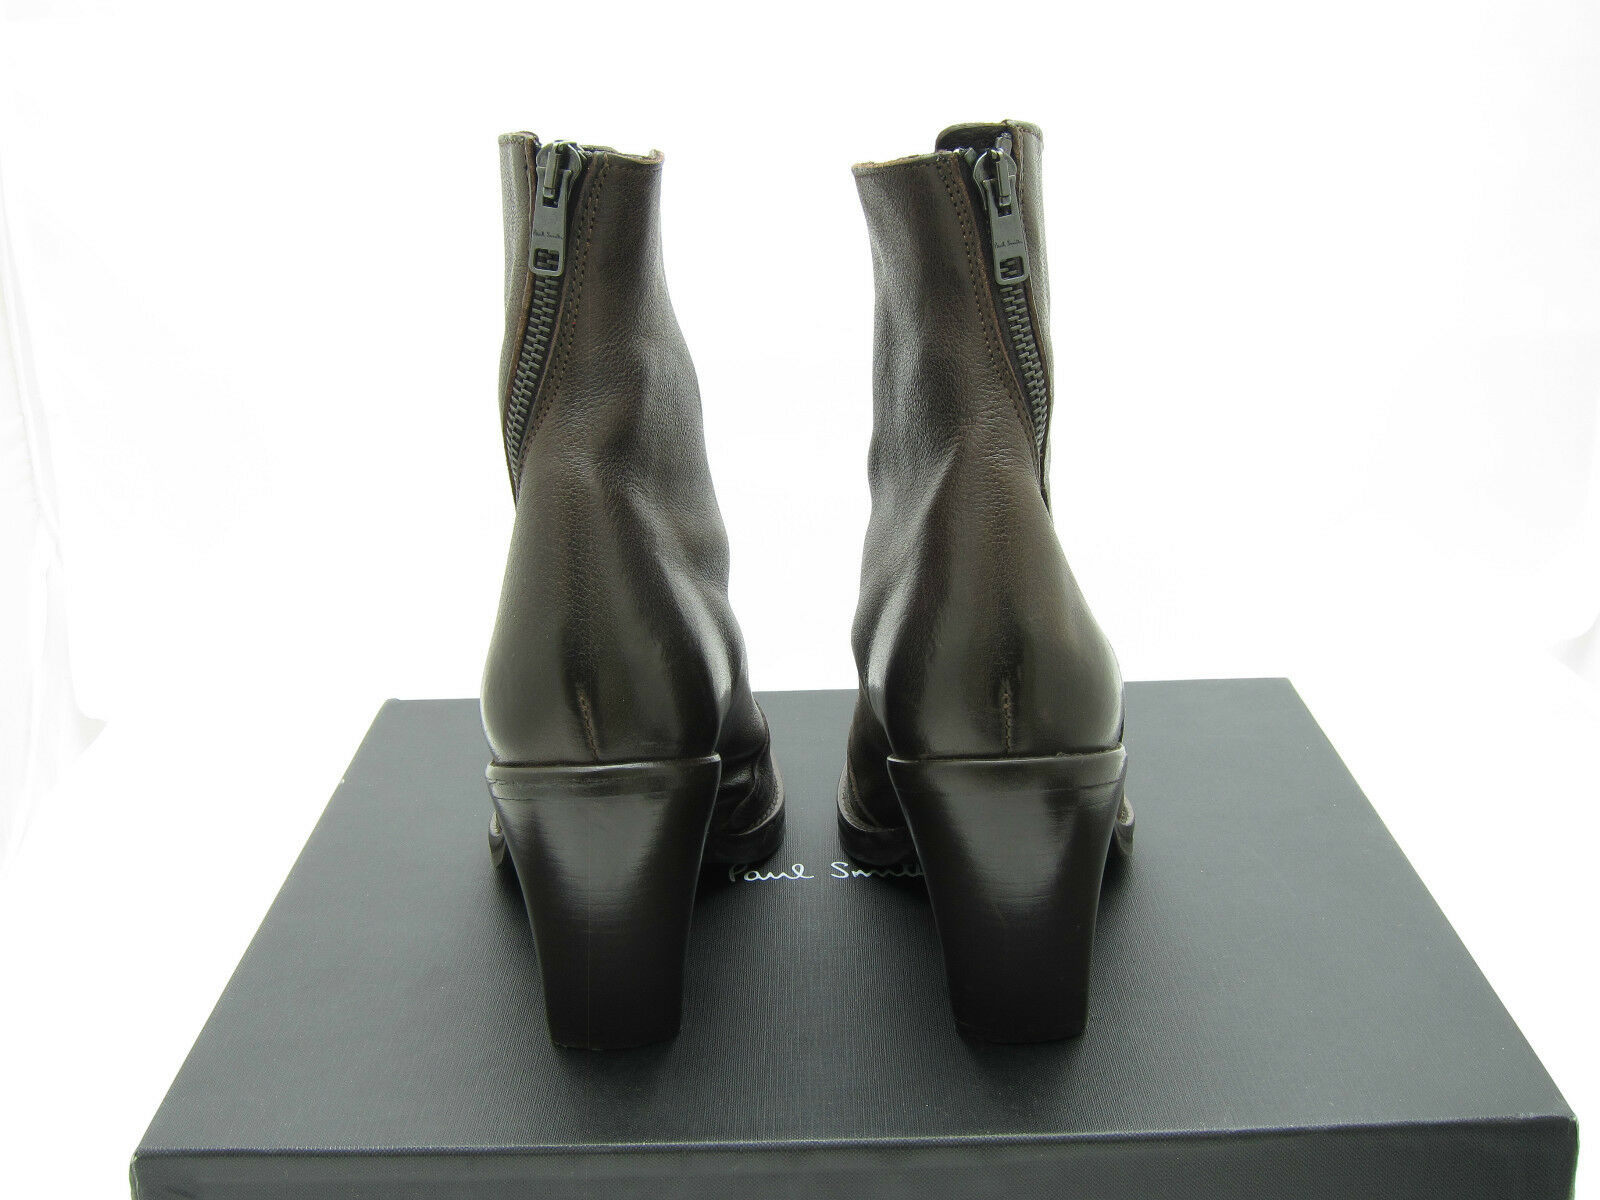 PAUL SMITH schuhe Glinn Stiefel Stiefel Stiefel Chocolate braun Größe 37.5 BNIB with dustbag c32be0